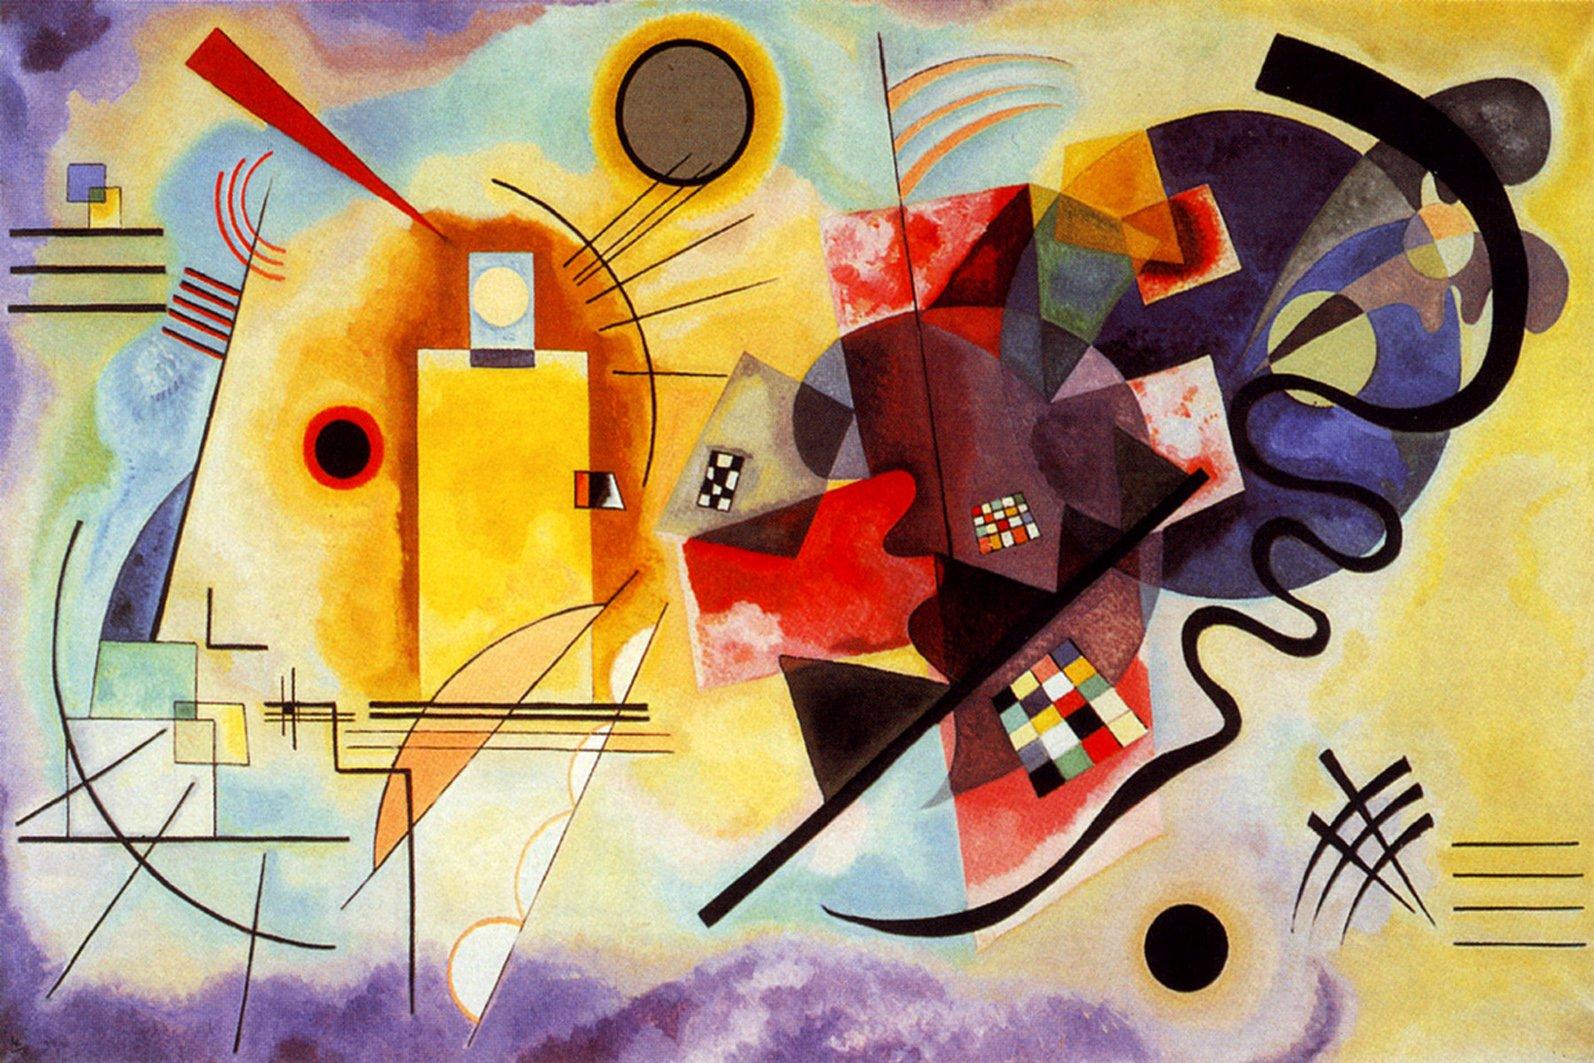 Legendarte P-273 Vassily Kandinsky, Tela e Legno, Multicolore, 60x90x4 cm